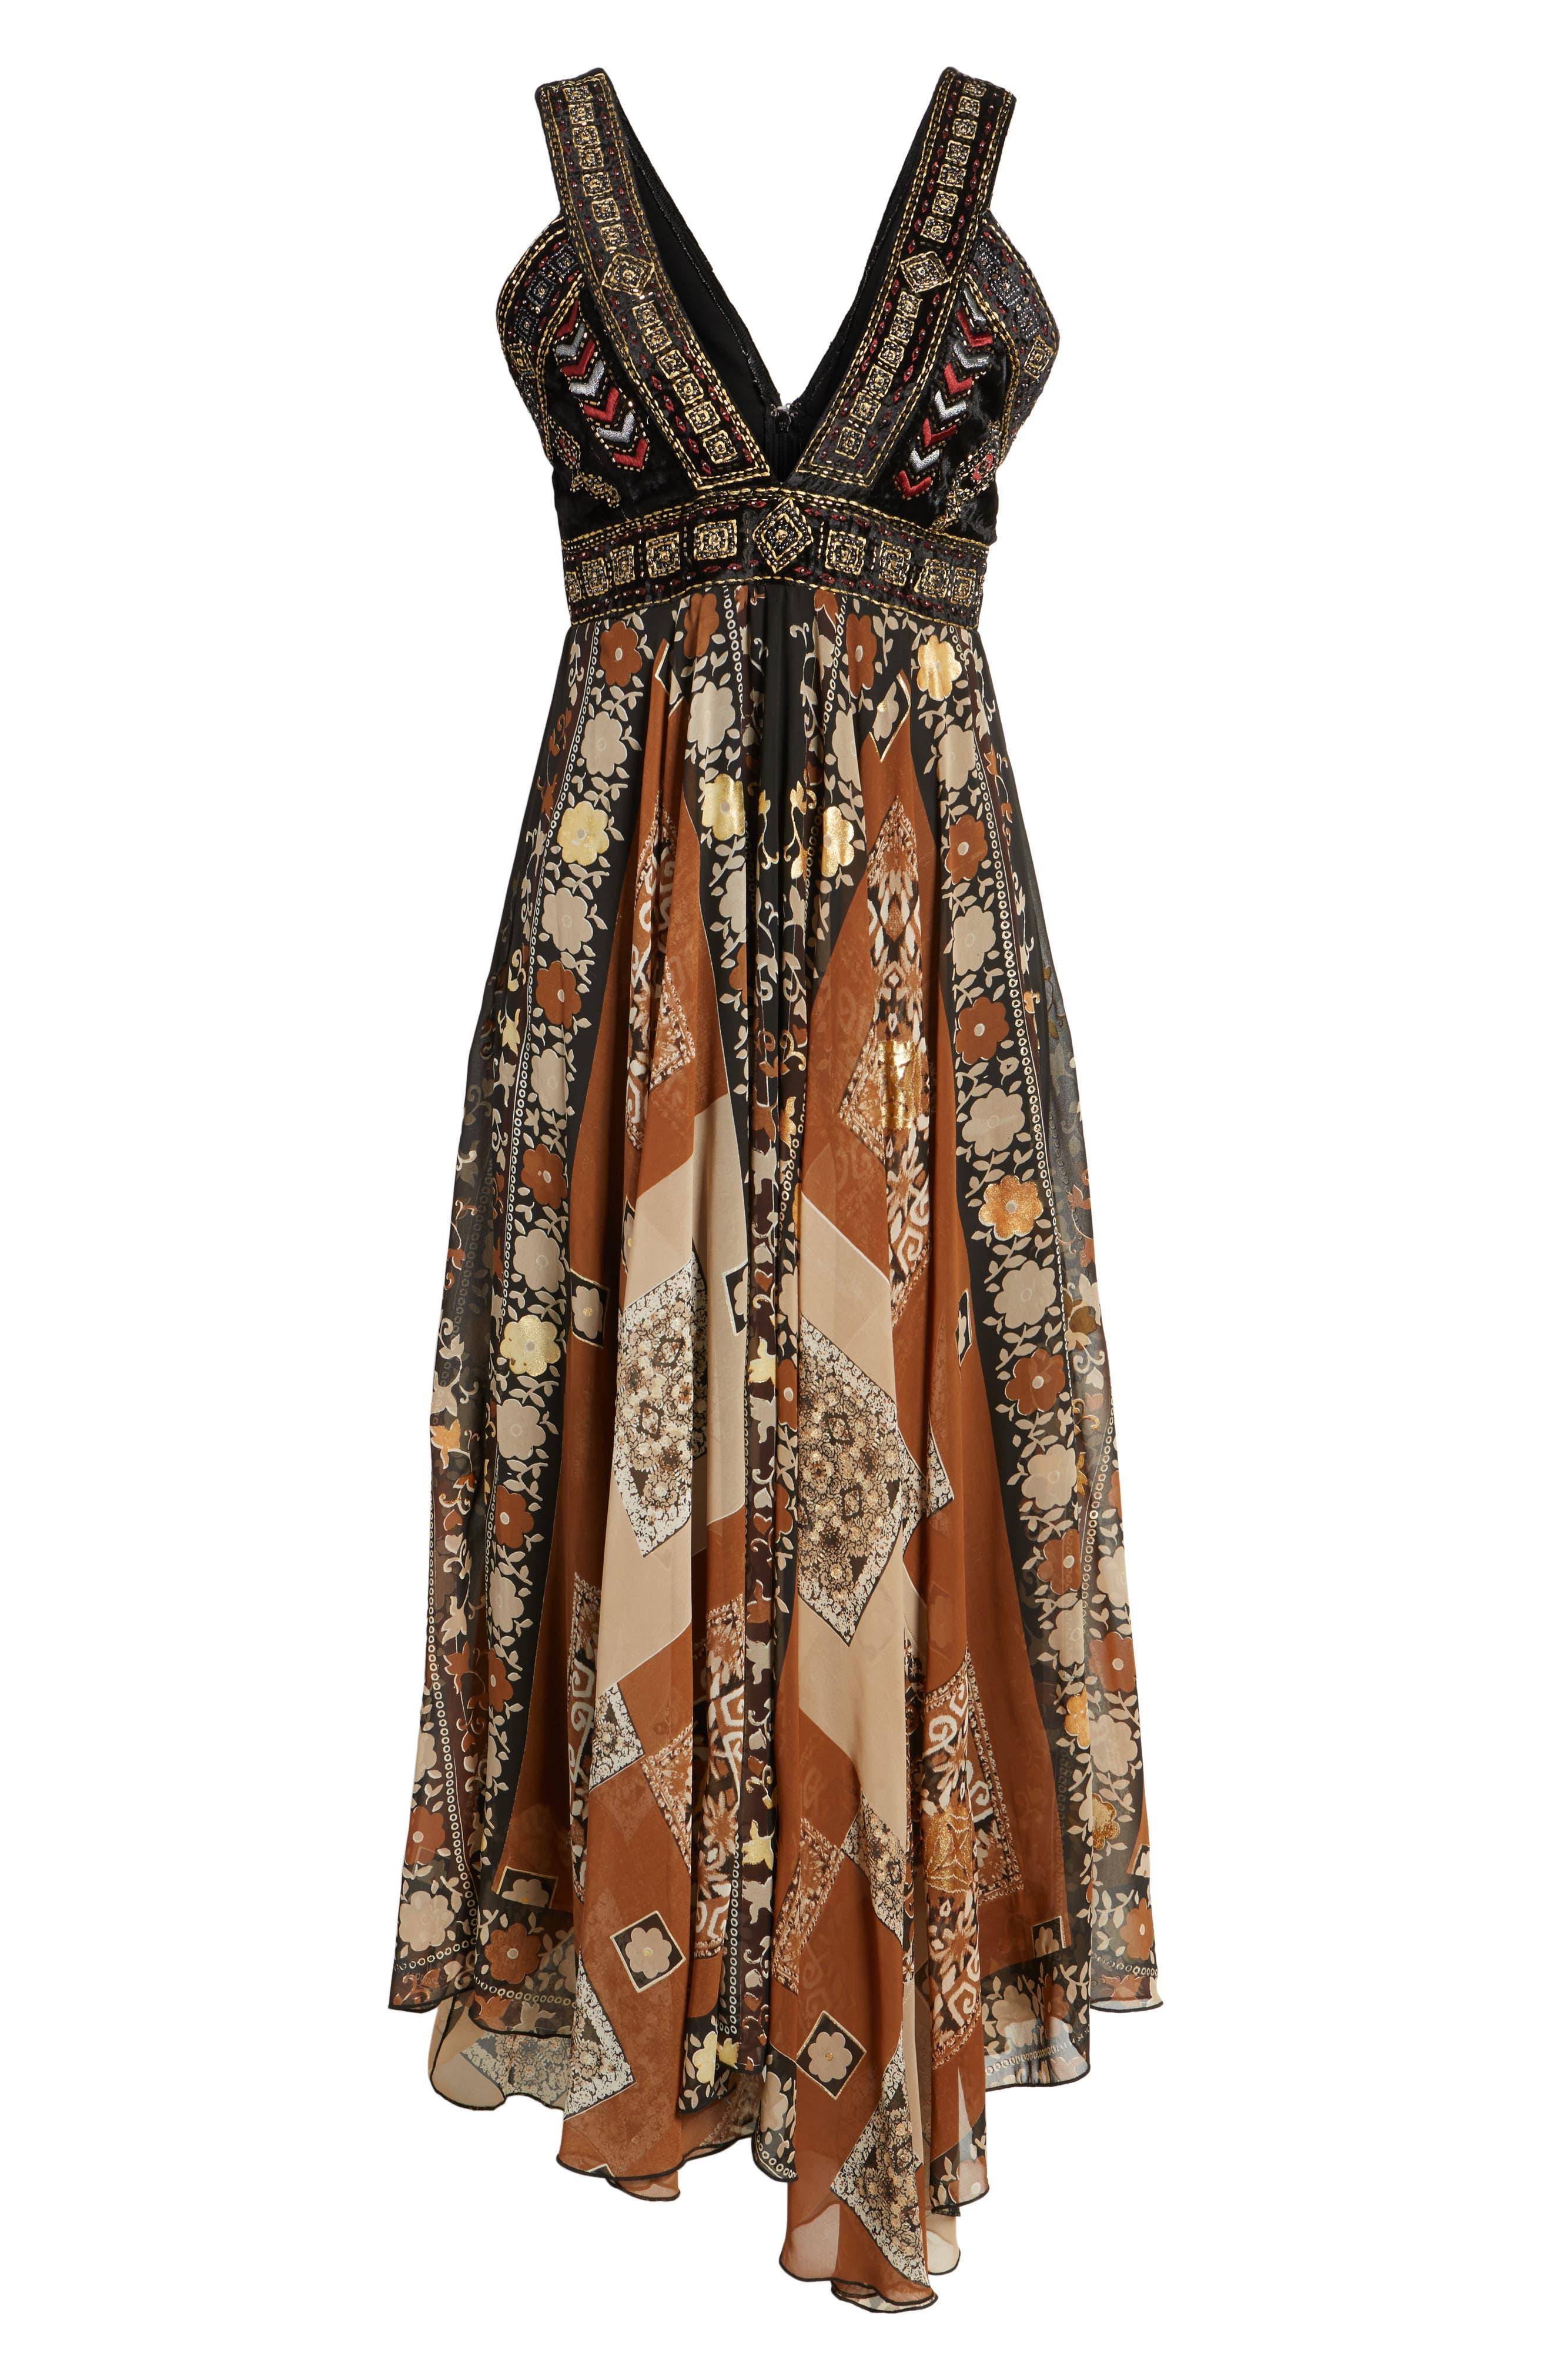 Sonder Embroidered Maxi Dress,                             Alternate thumbnail 6, color,                             200